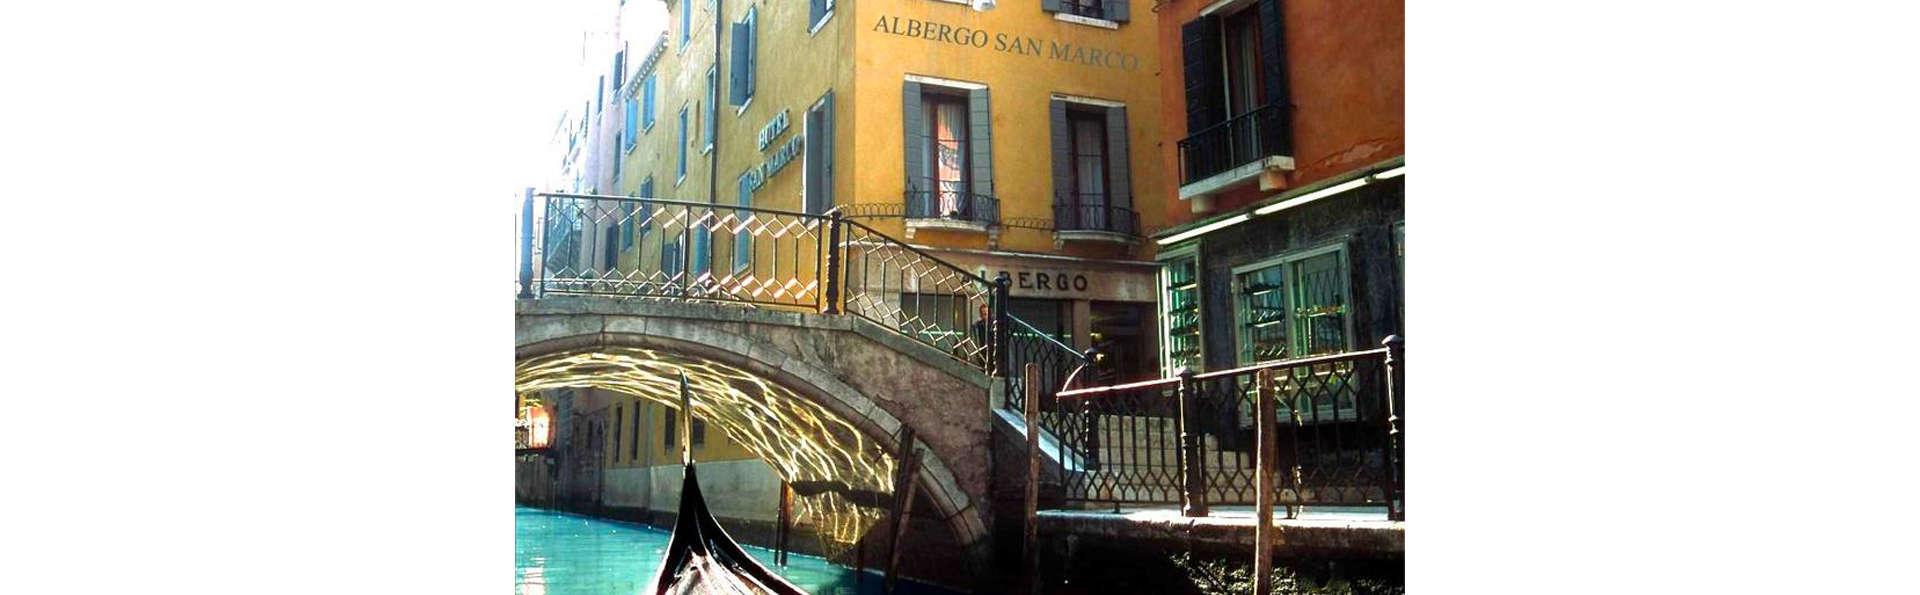 Albergo San Marco - EDIT_FRONT_01.jpg